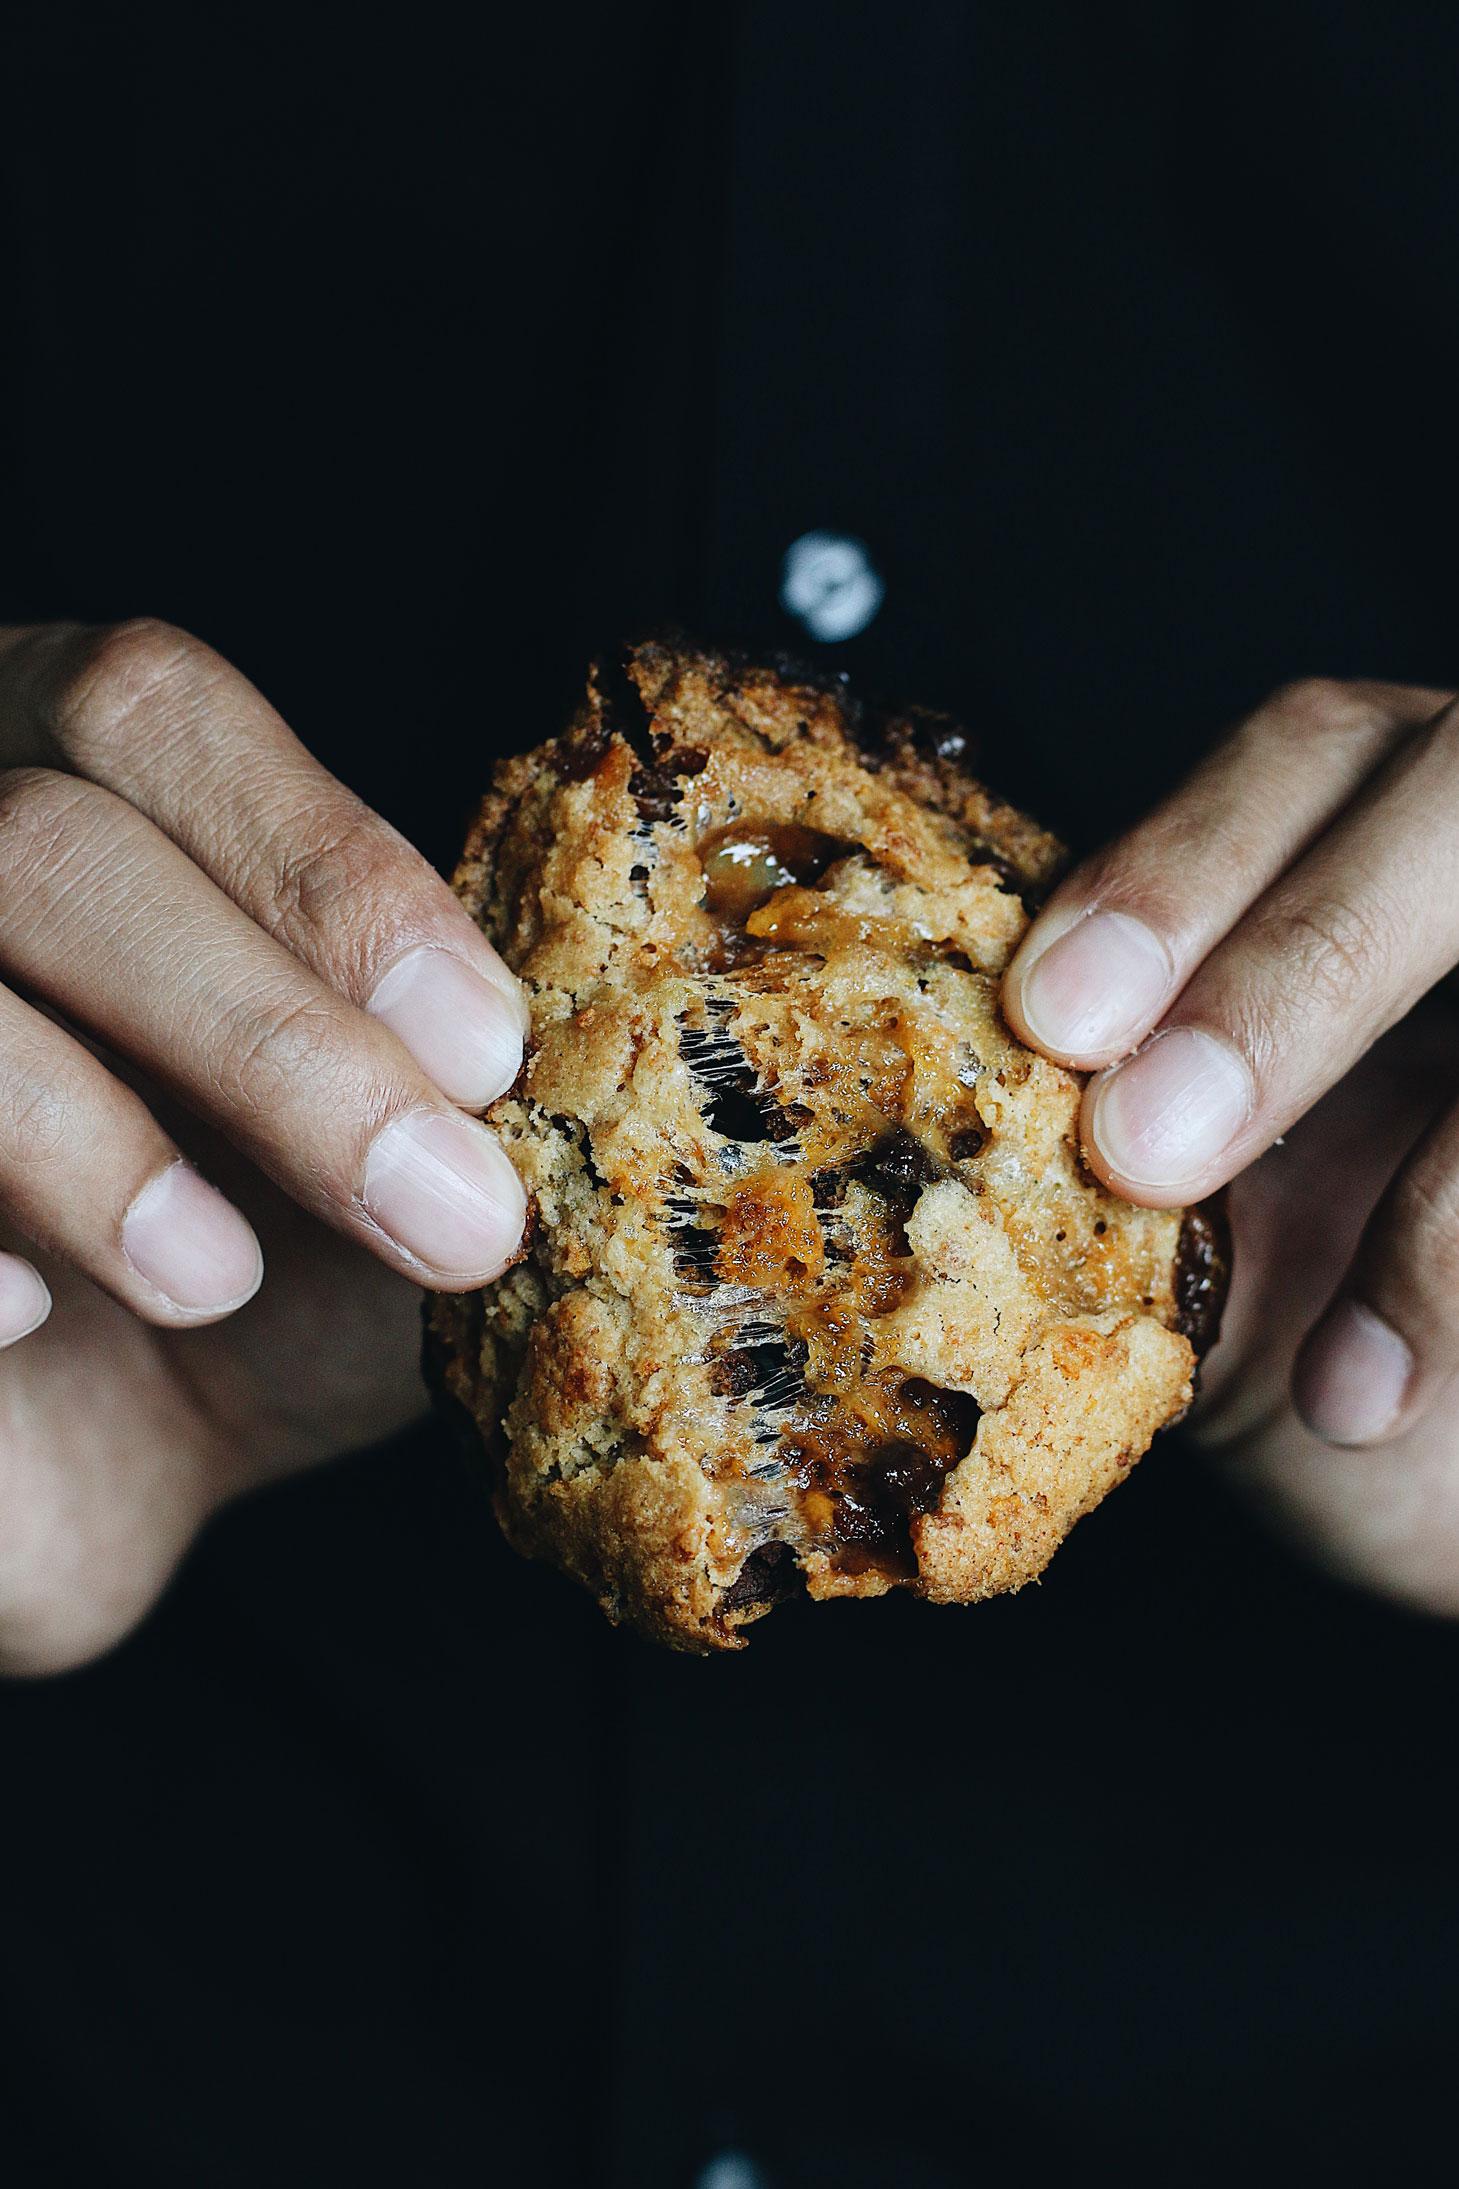 momofuku-milk-bar-cornflake-marshmallow-chocolate-cookie